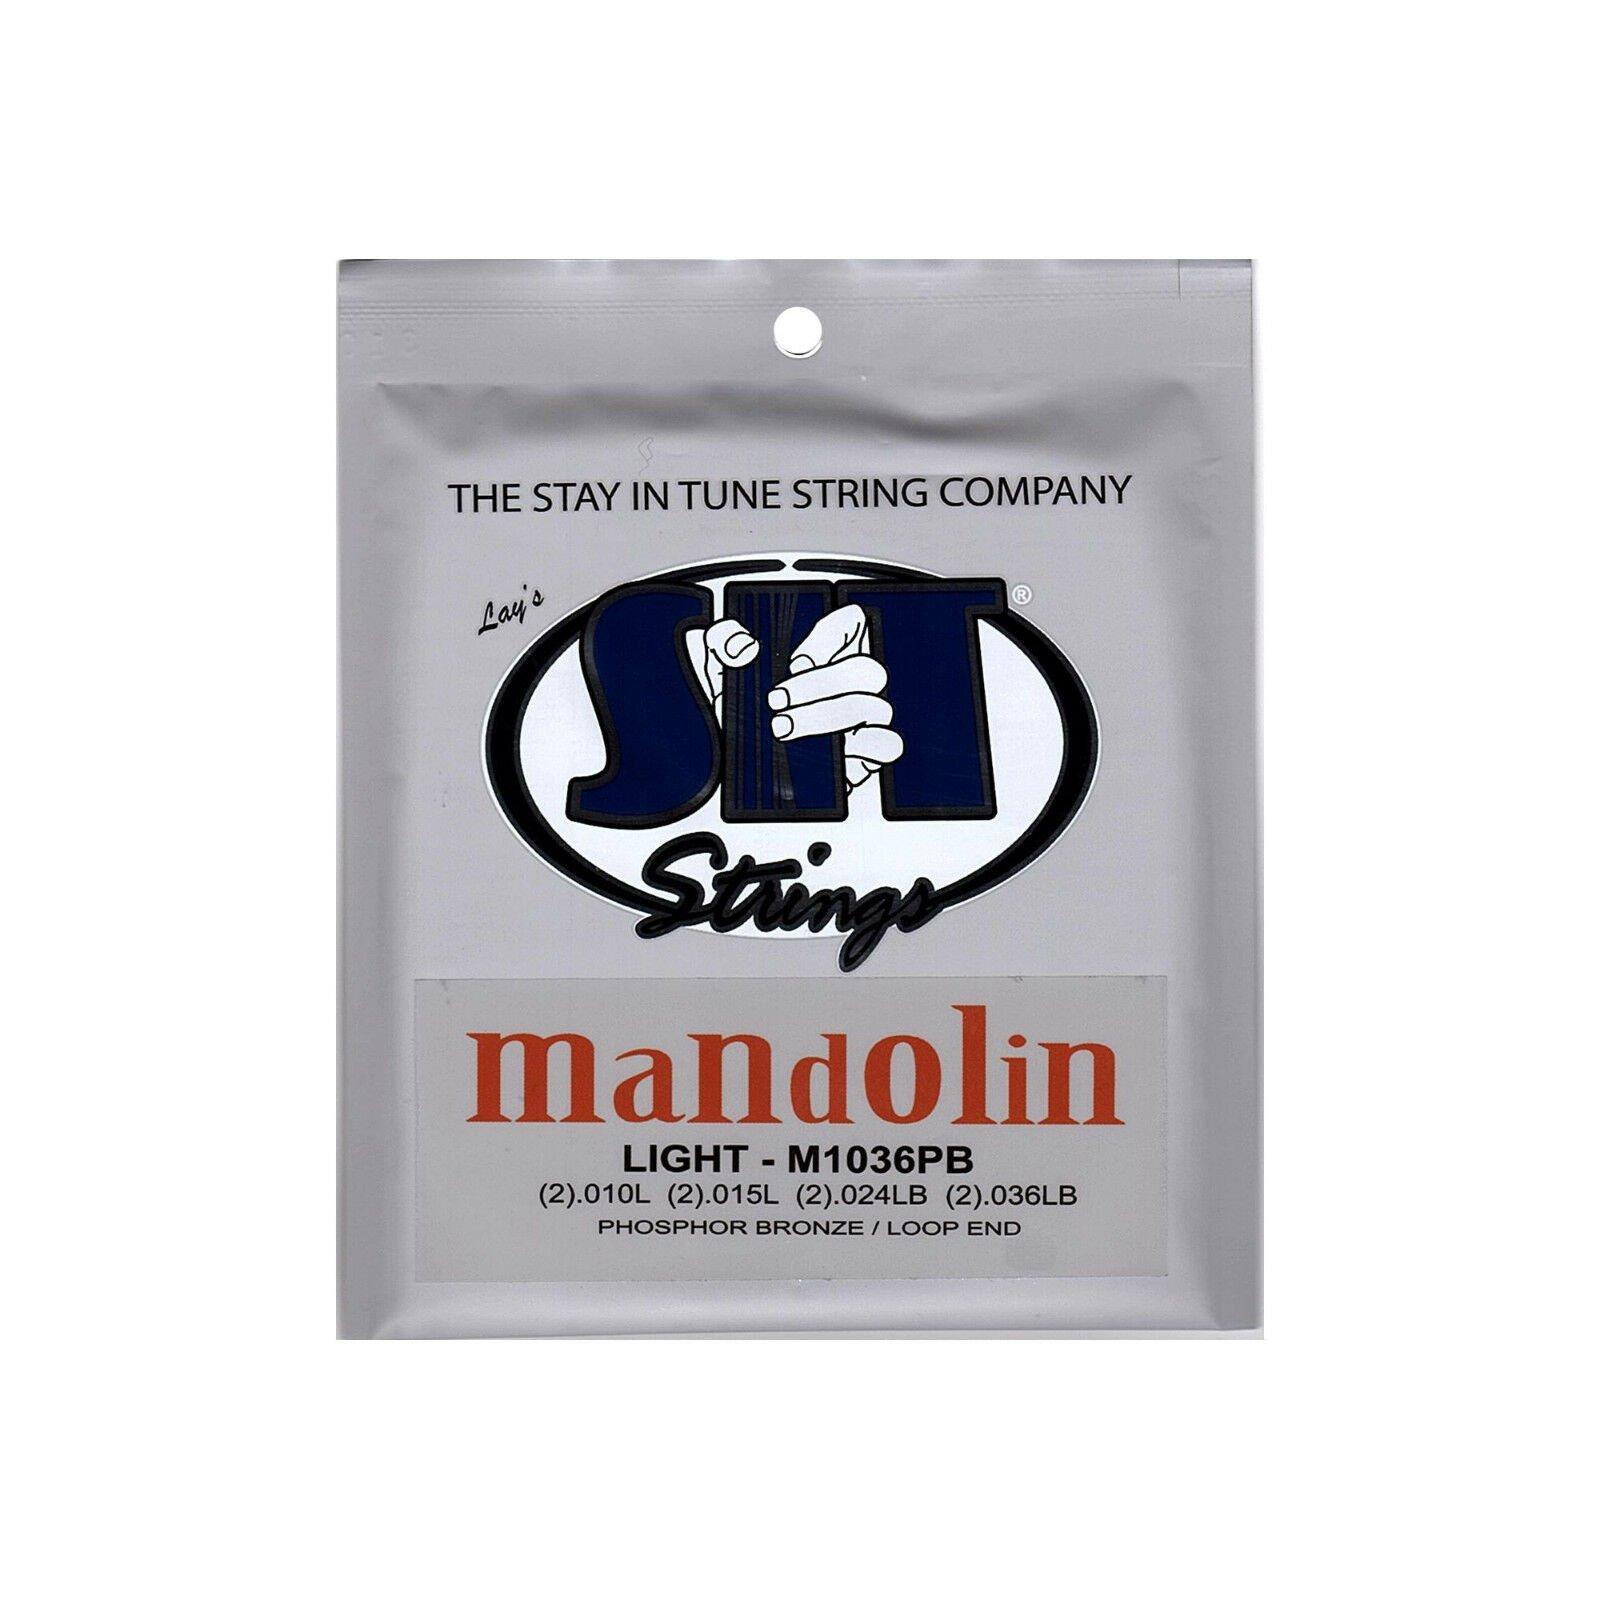 SIT Mandolin Strings Looped End Phosphor Bronze Light M1036PB